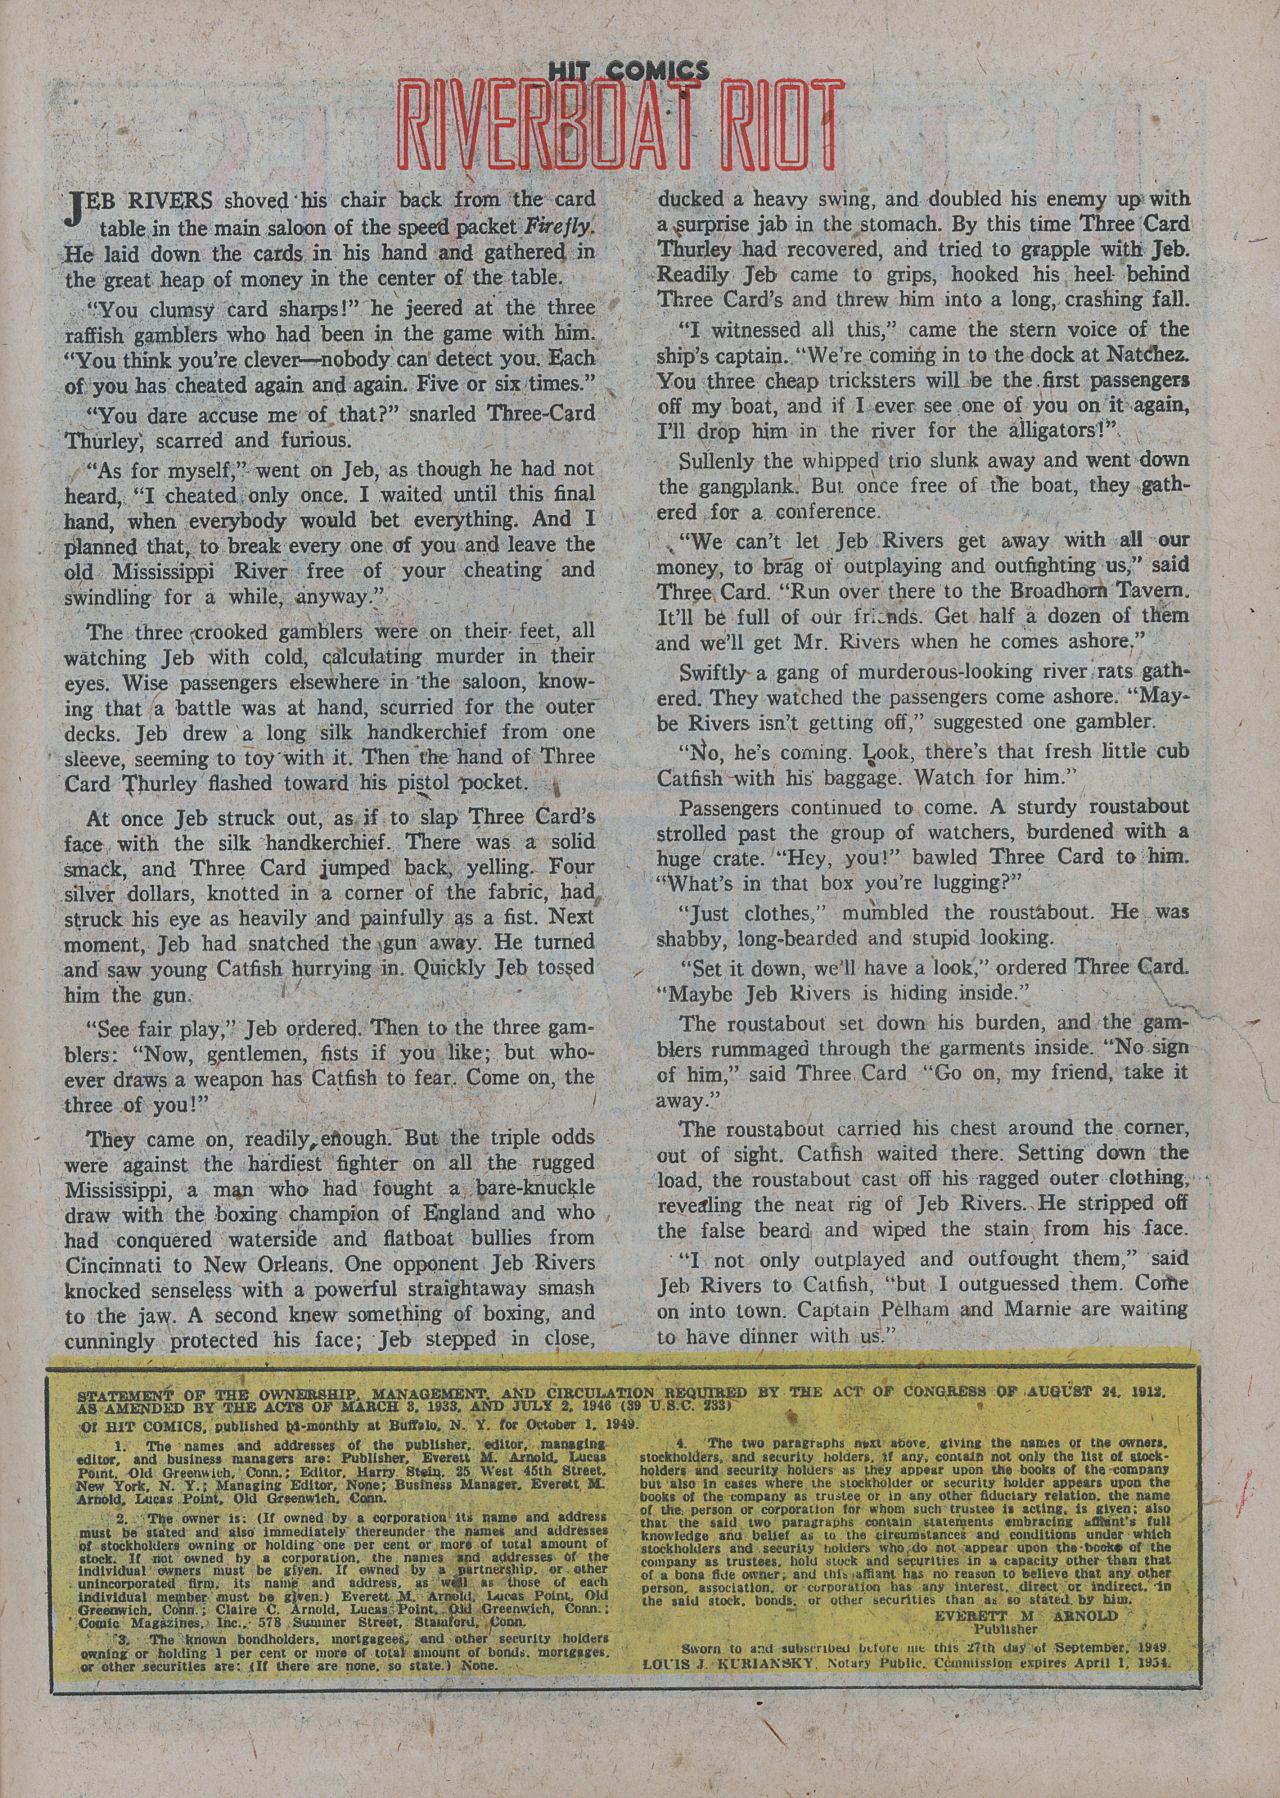 Read online Hit Comics comic -  Issue #63 - 27